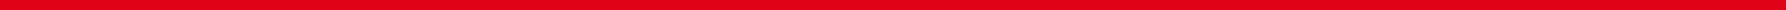 Red Line Option 2